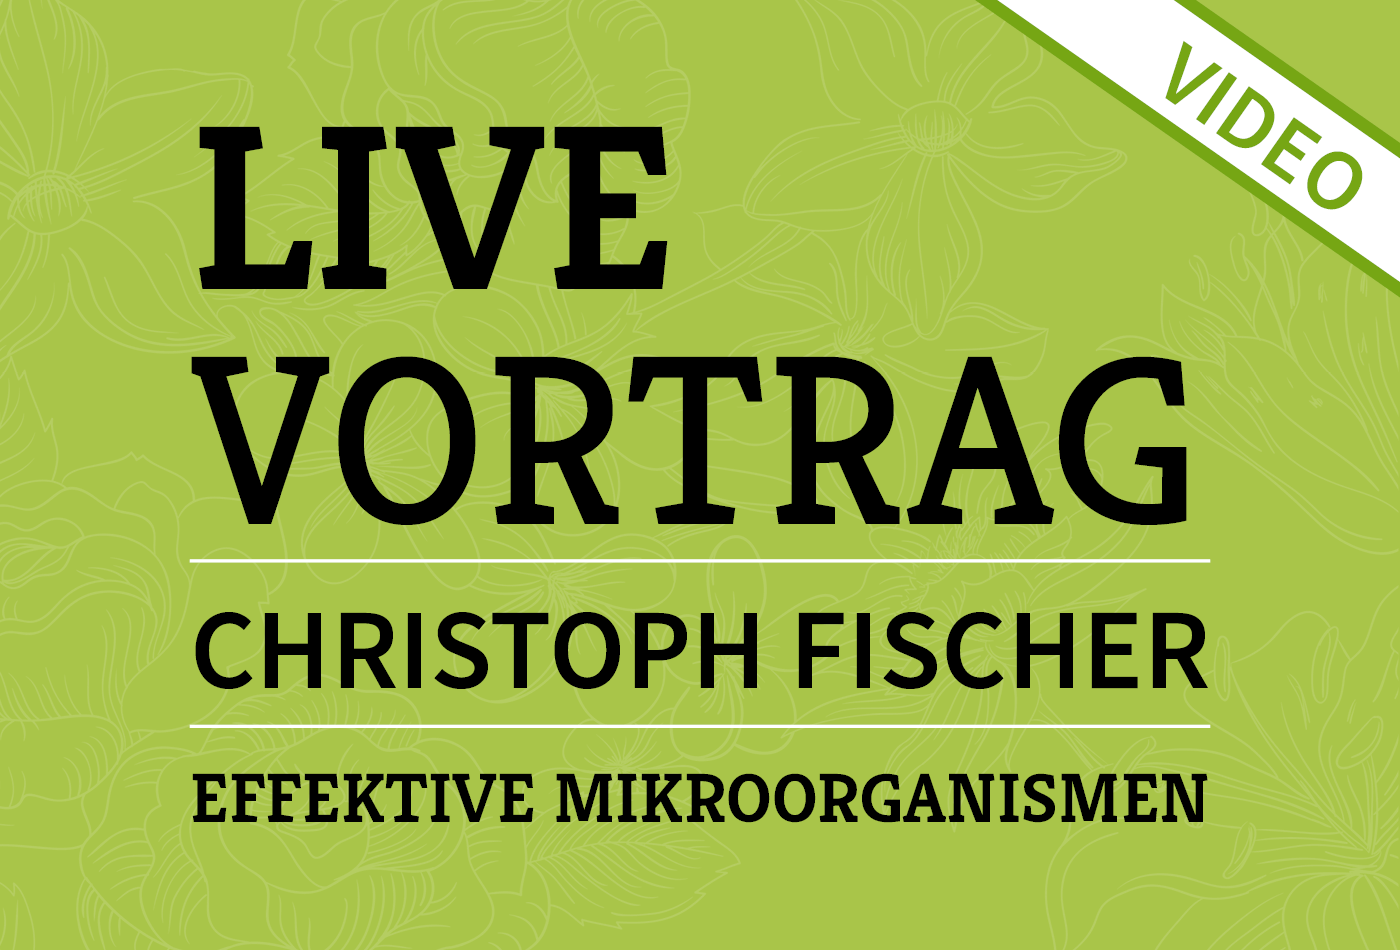 Vortrag Effektive Mikroorganismen